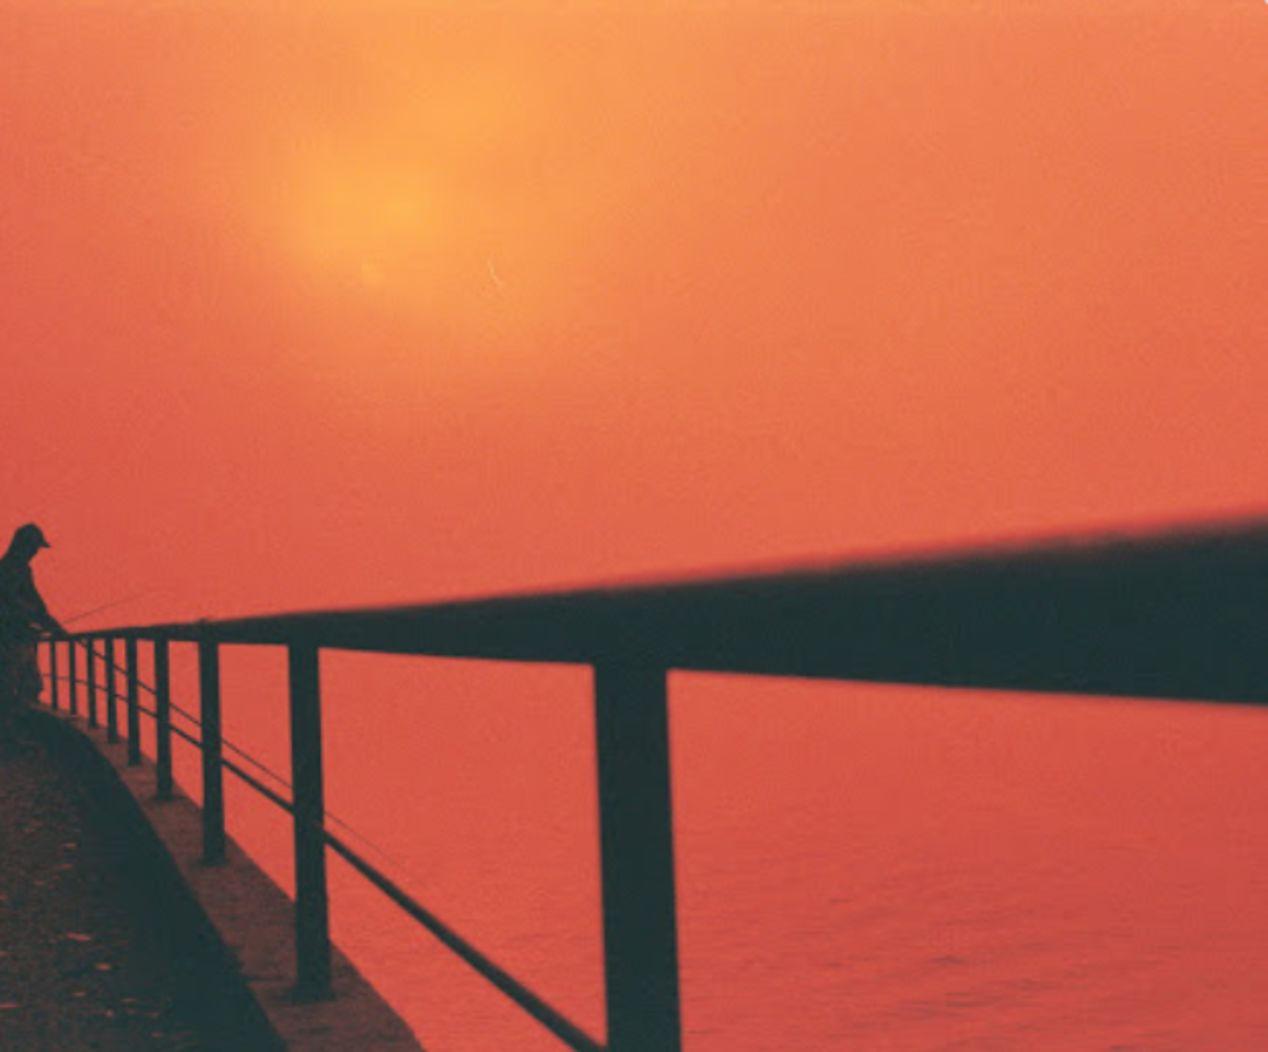 Douto Margin near Ponte da Arrábida. Olympus OM-10, 50mm, Redscale film.